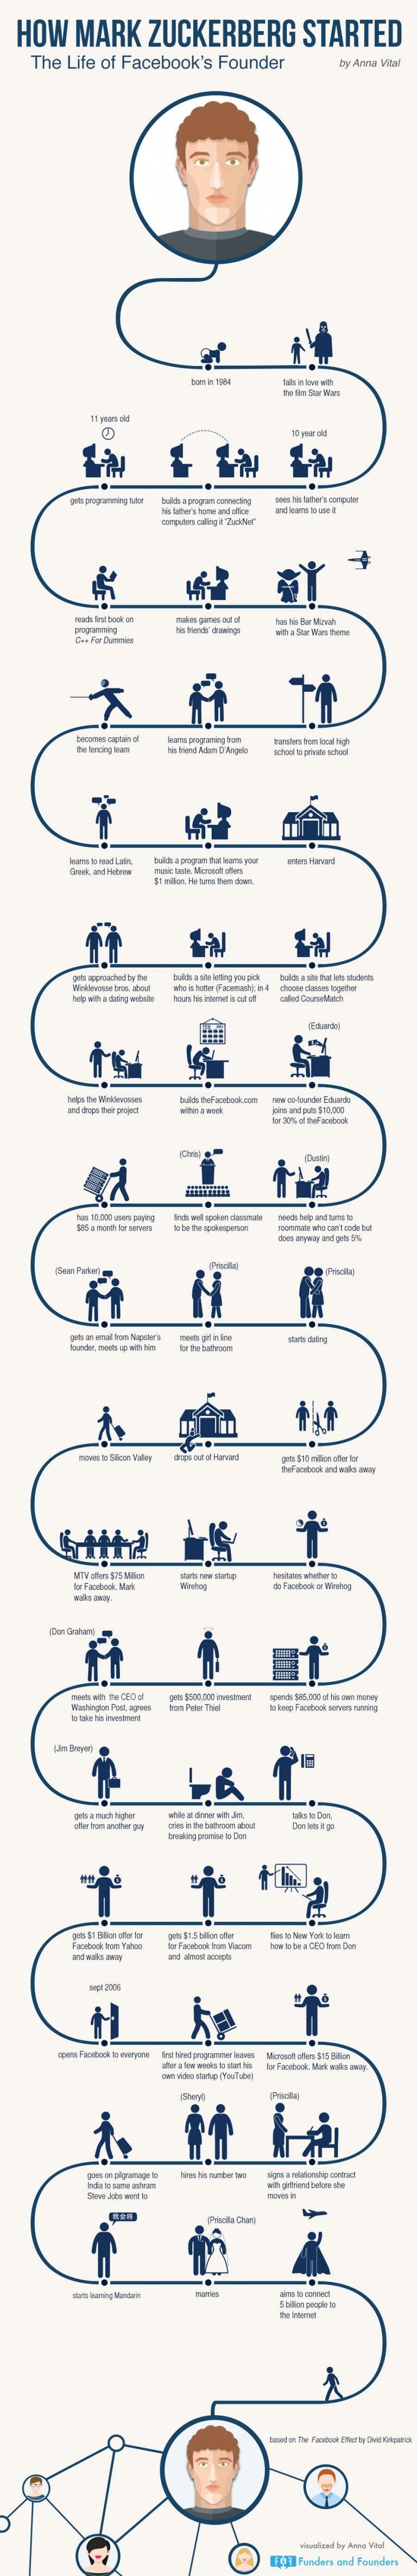 How Mark Zuckerberg Started - Infographic